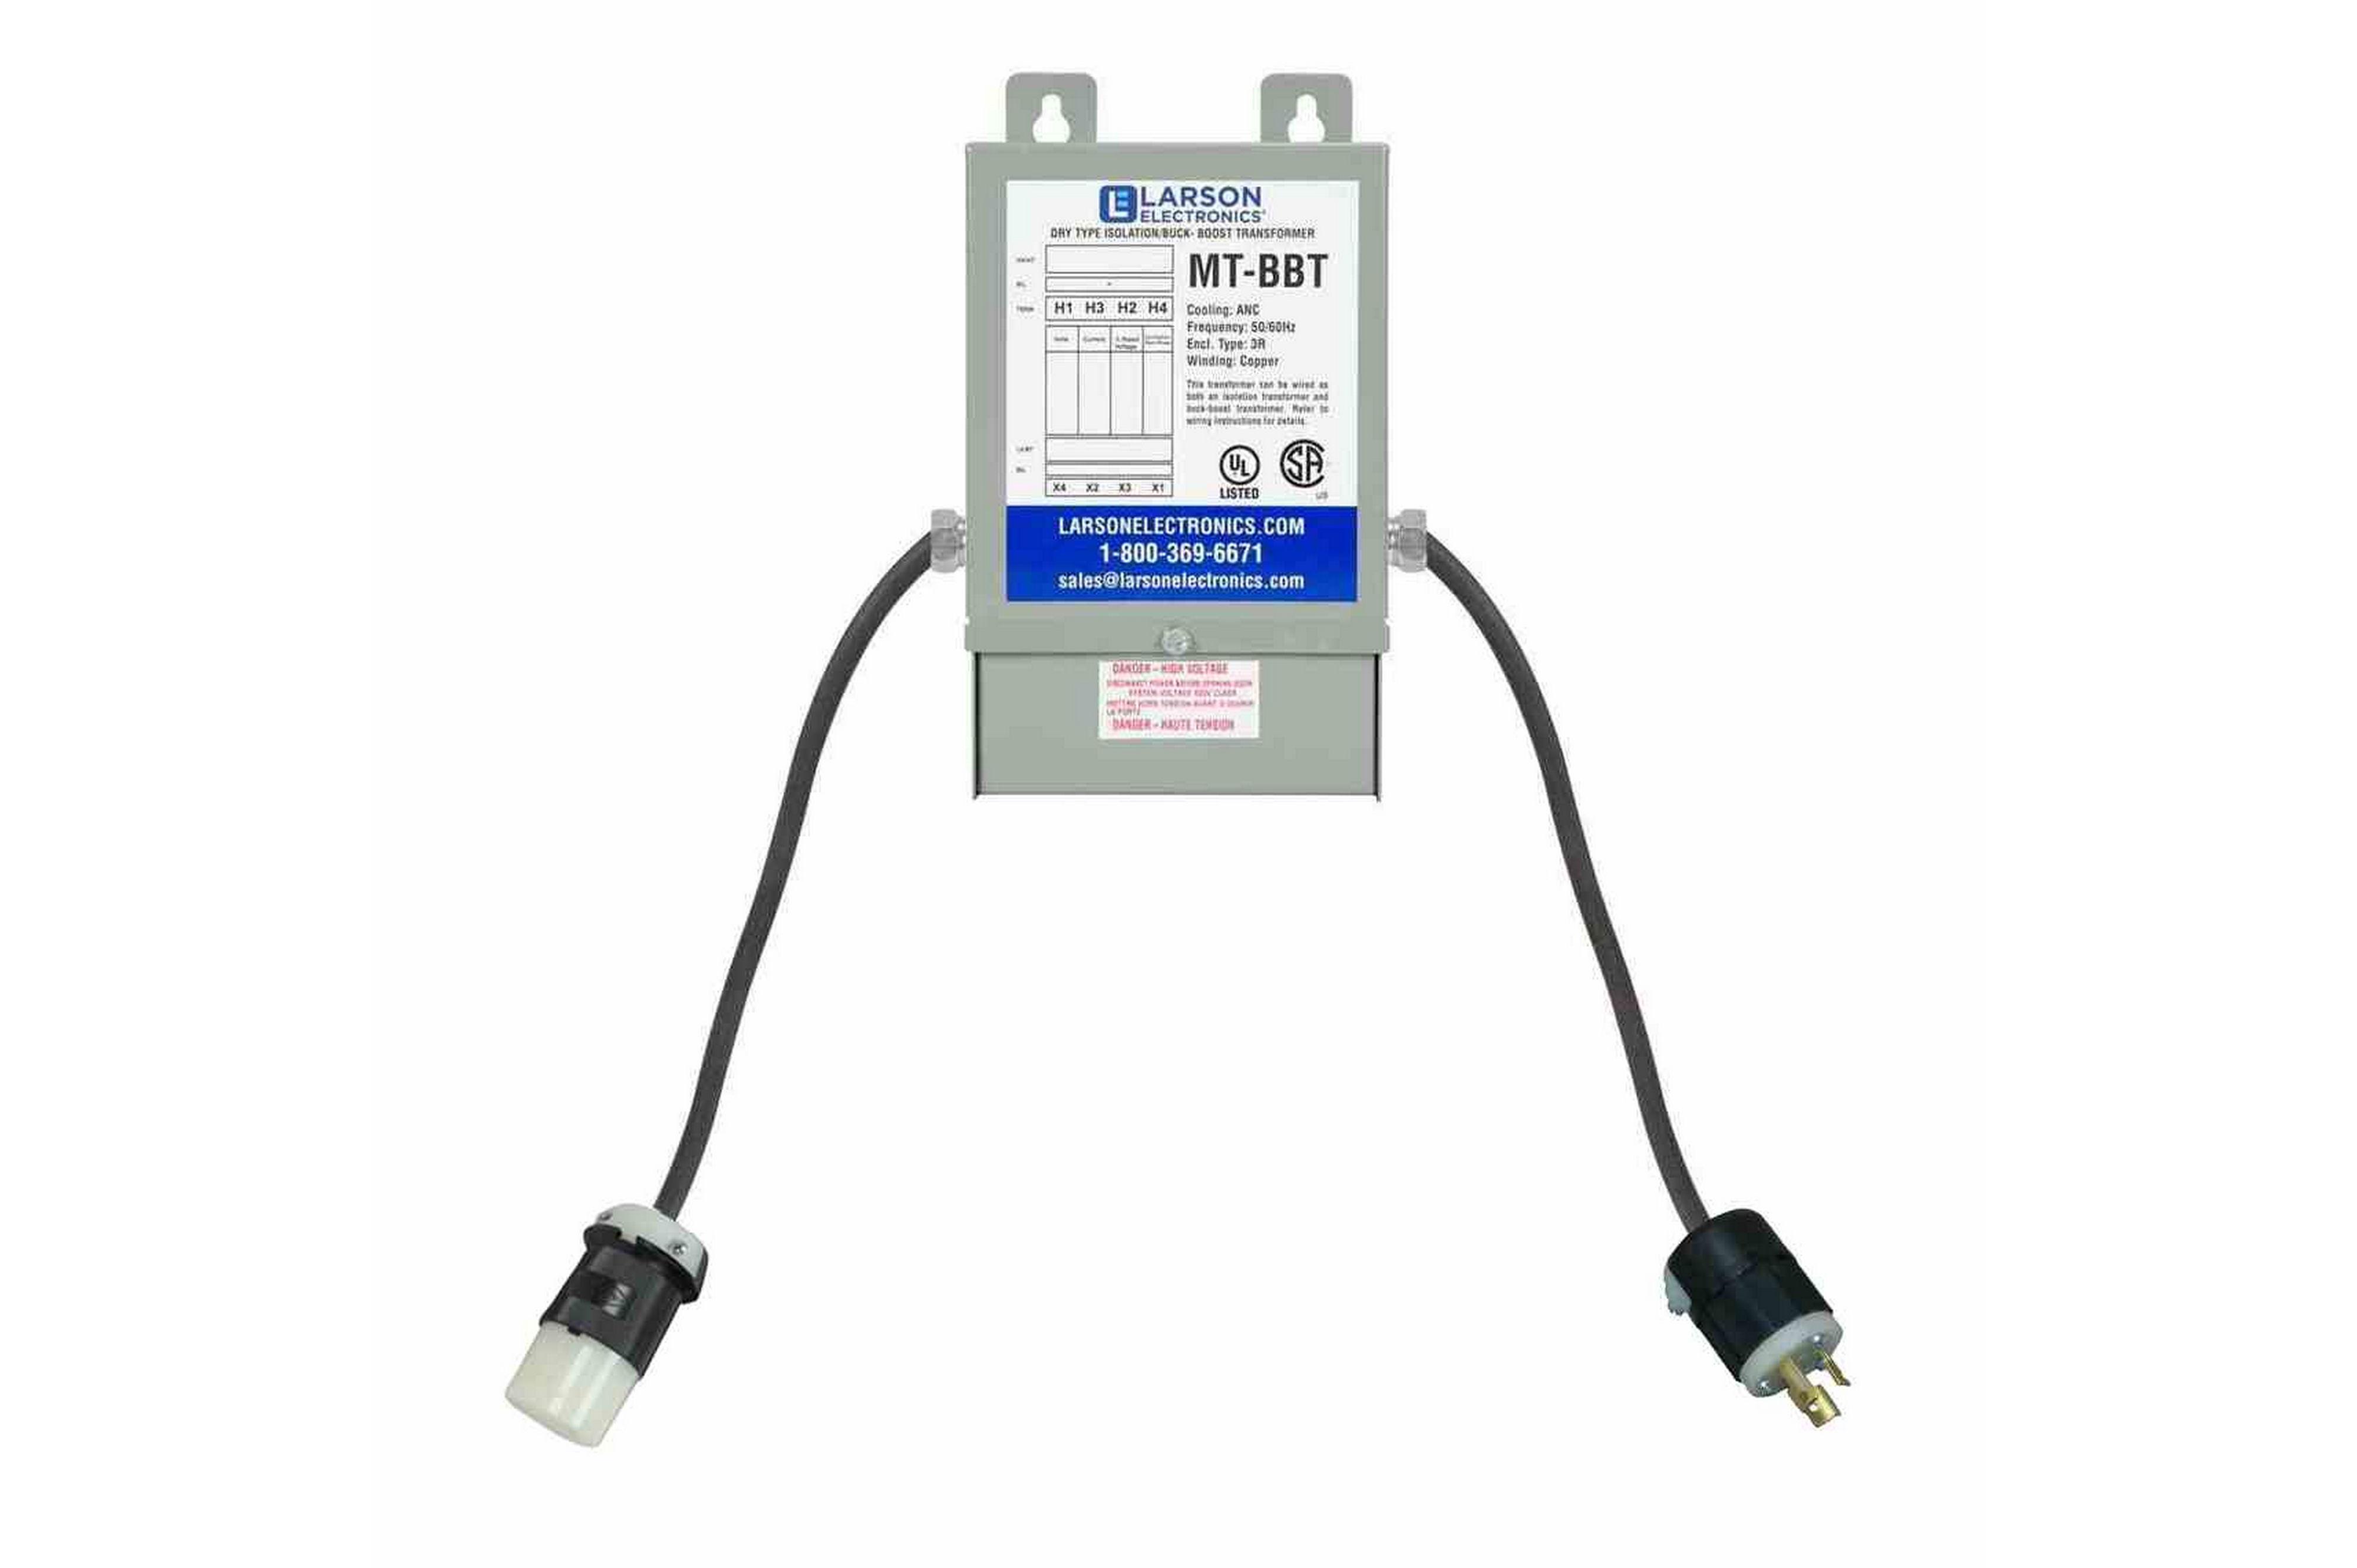 480 to 208 transformer wiring